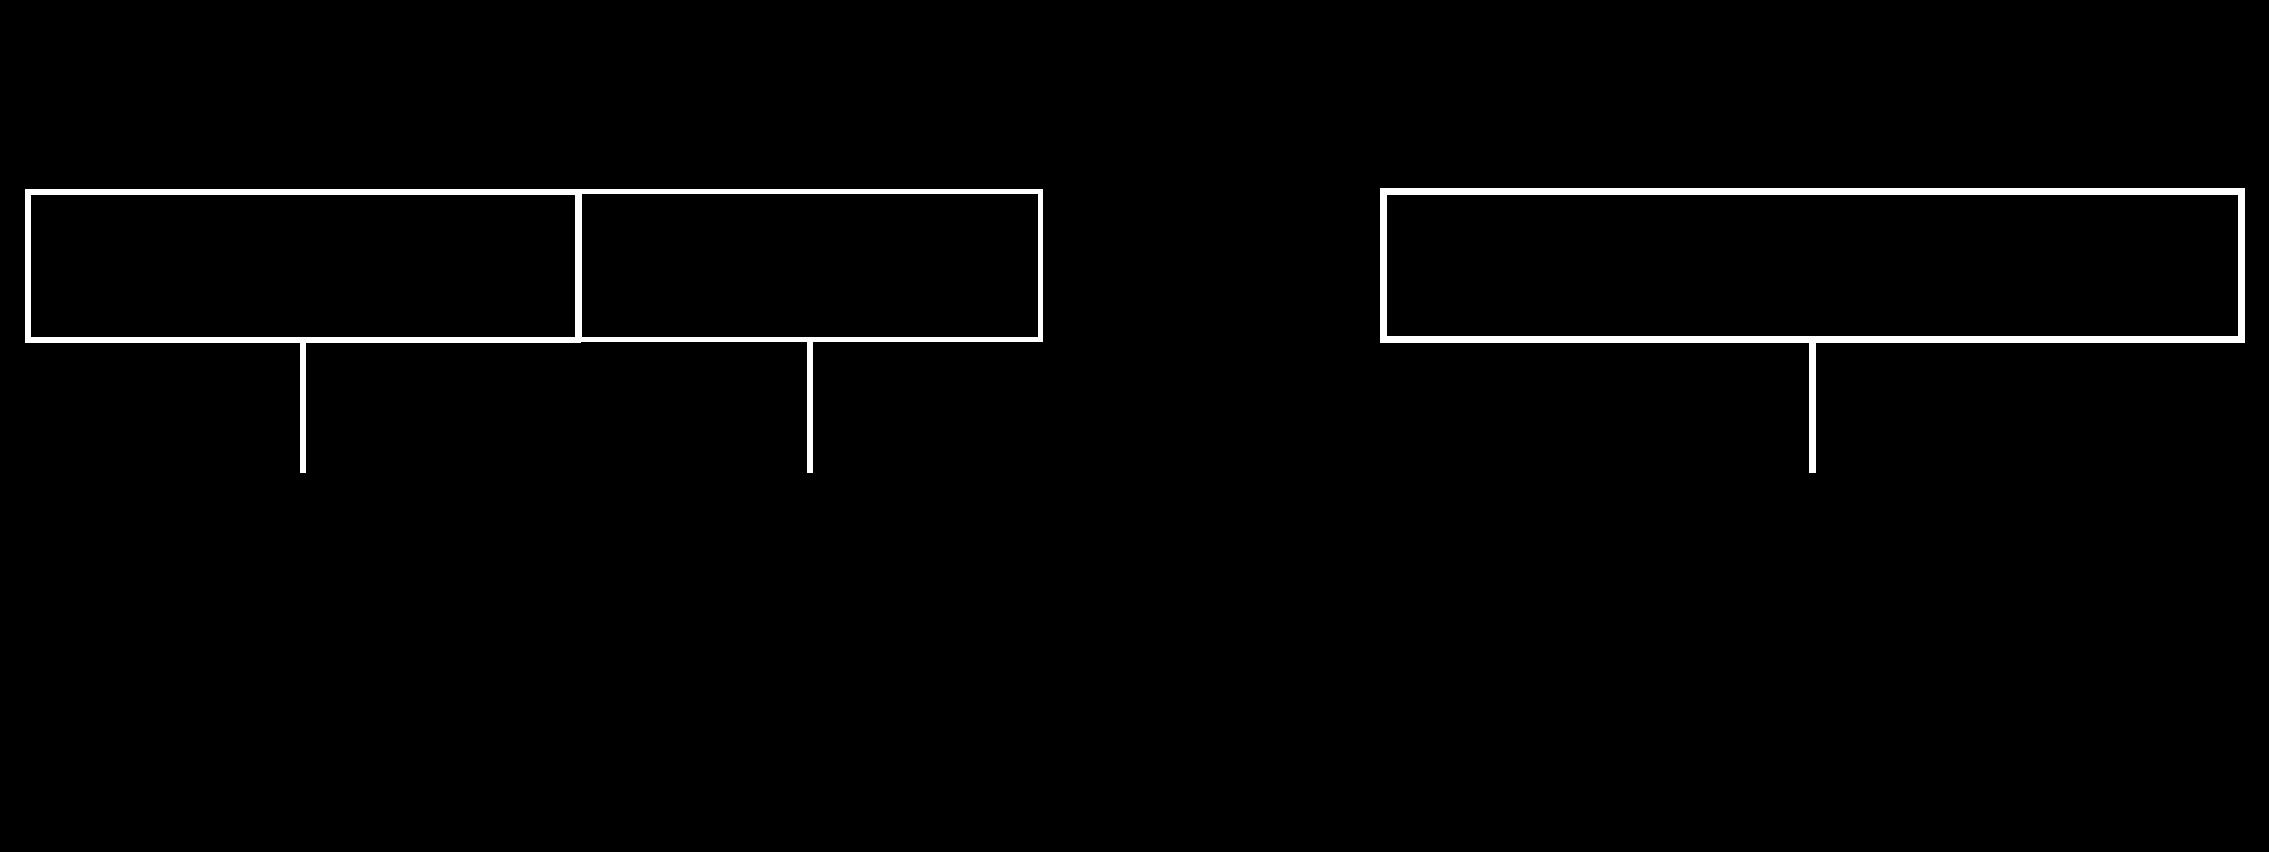 sponda_brand_positioning-01